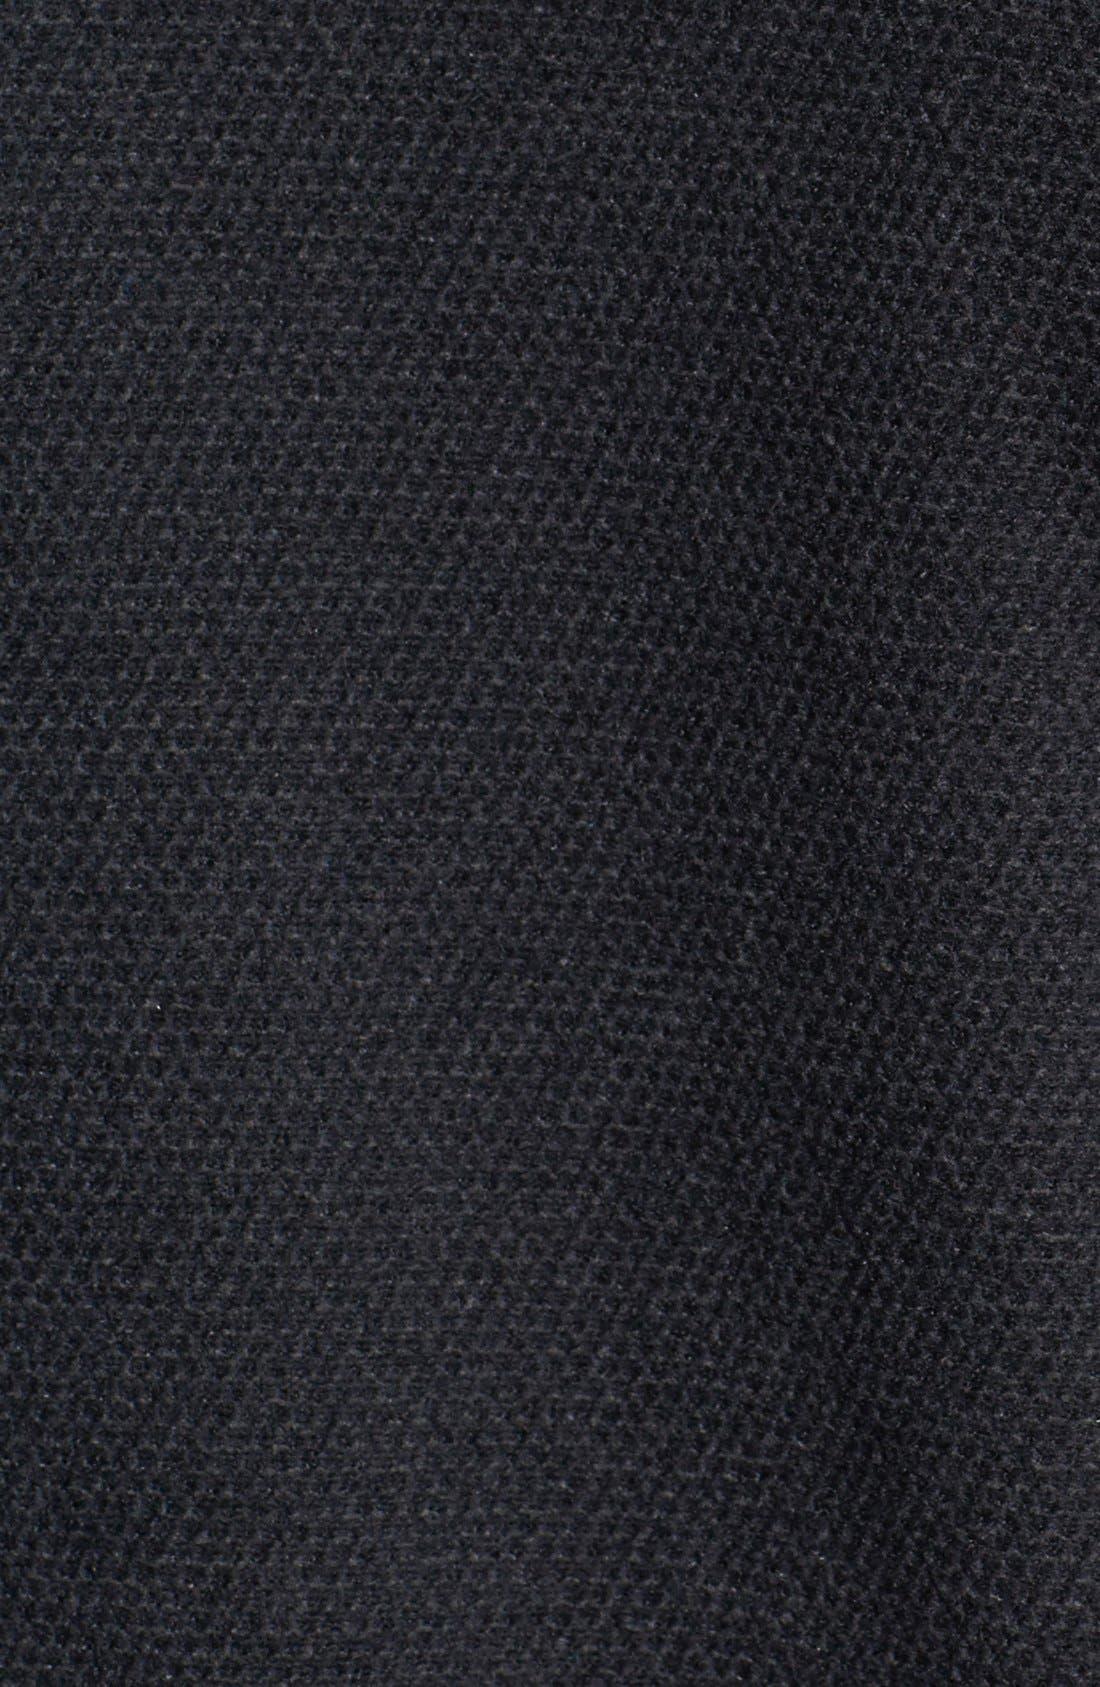 Alternate Image 3  - Arc'teryx 'Strato' Water Repellent Jacket